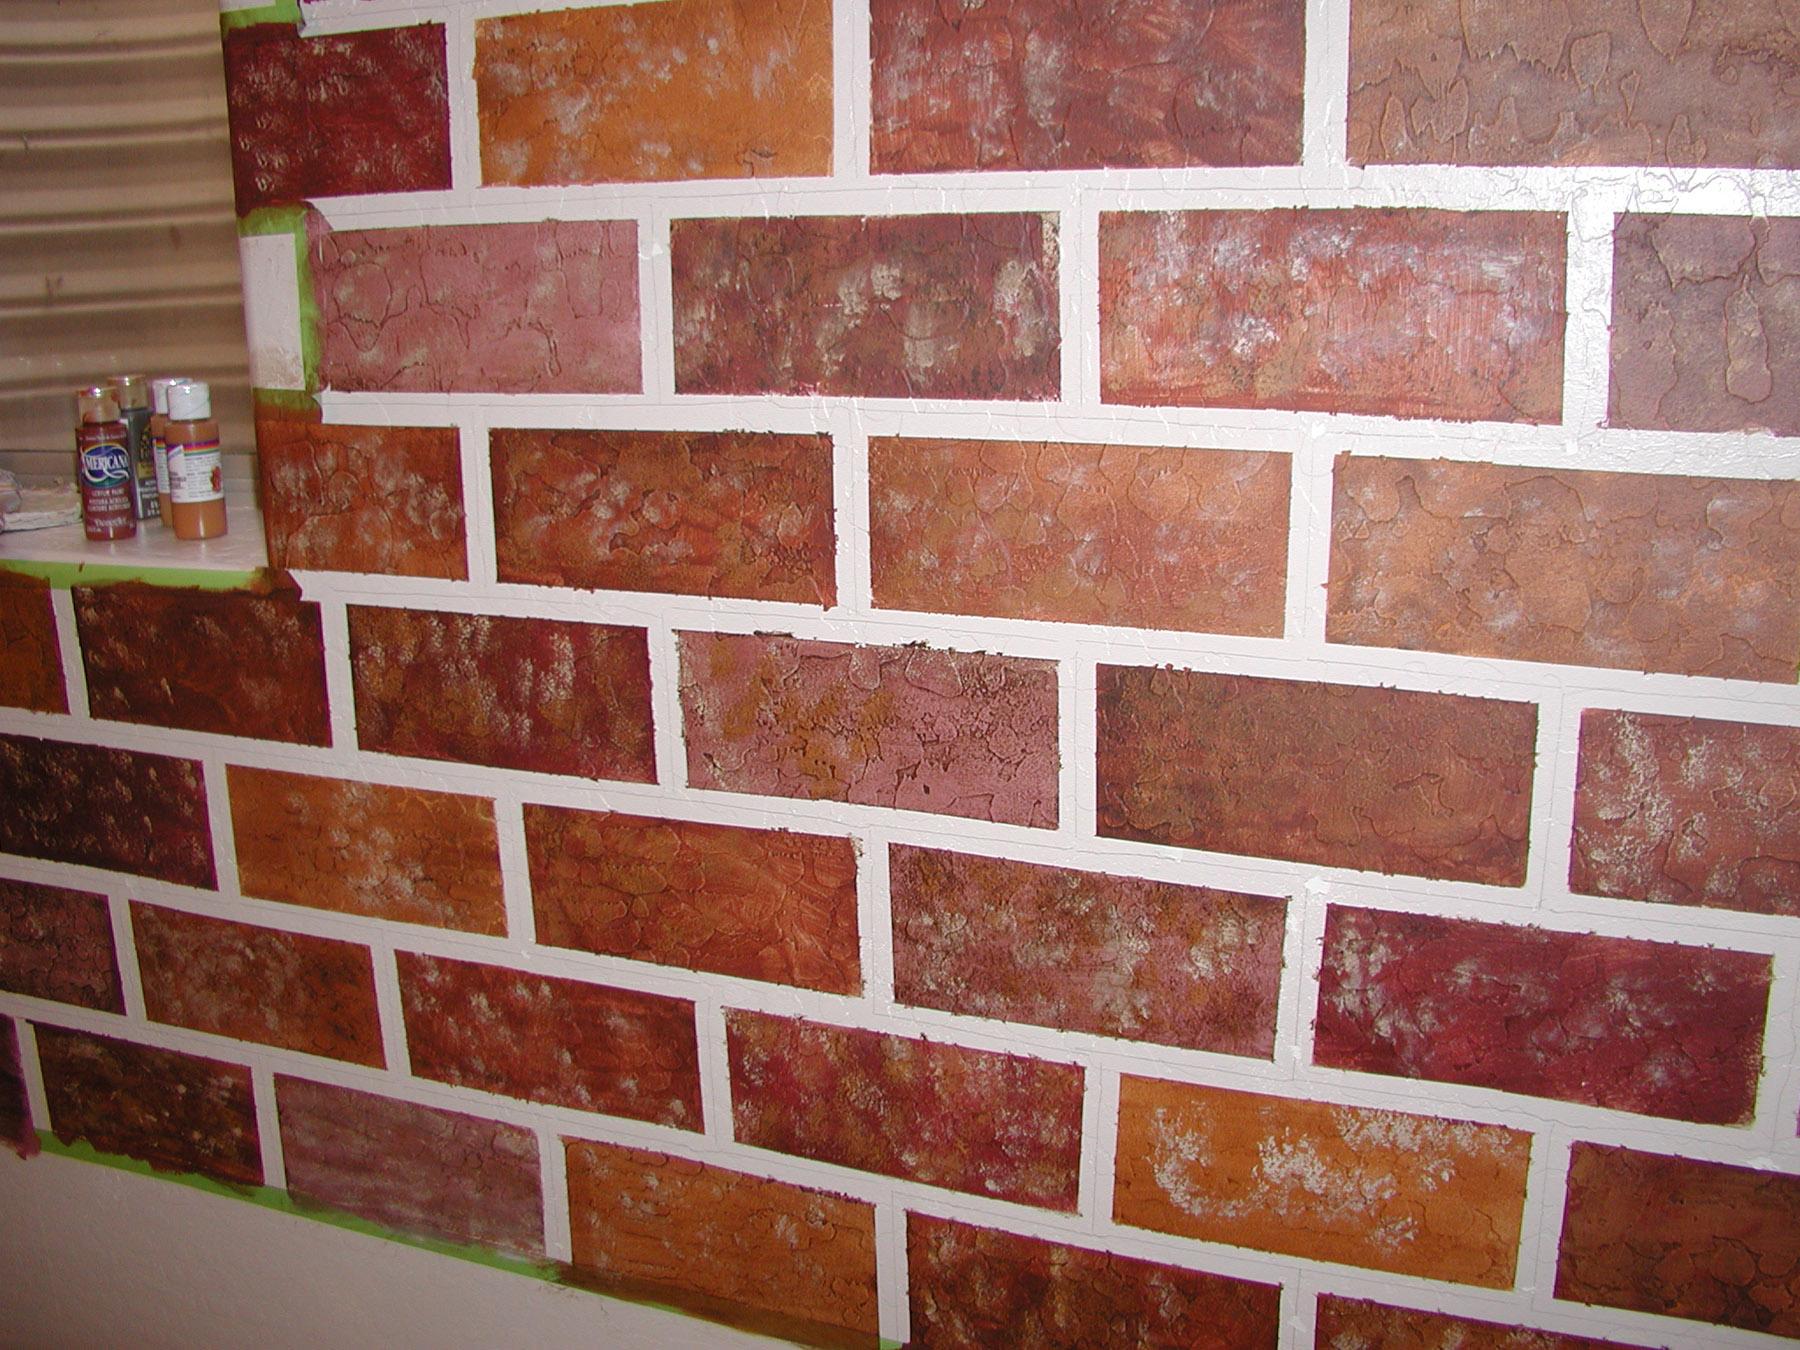 Wall treatment ideas | Sawdust and Paint on Brick Painting Ideas  id=21069